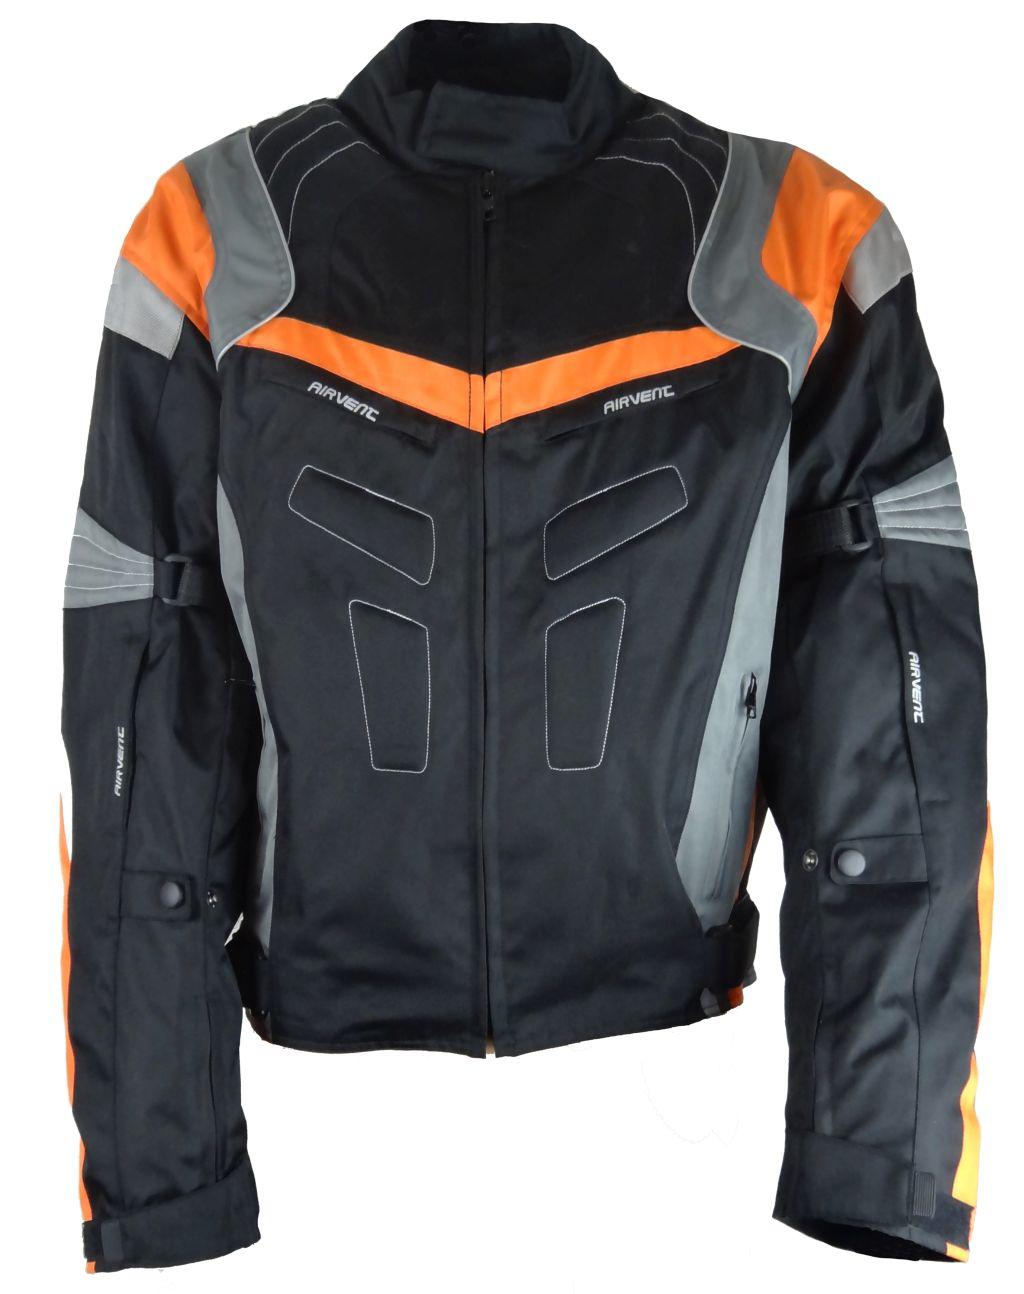 Bangla Motorrad Textil Jacke Cordura Orange schwarz weiss grau Musterstück 3 XL